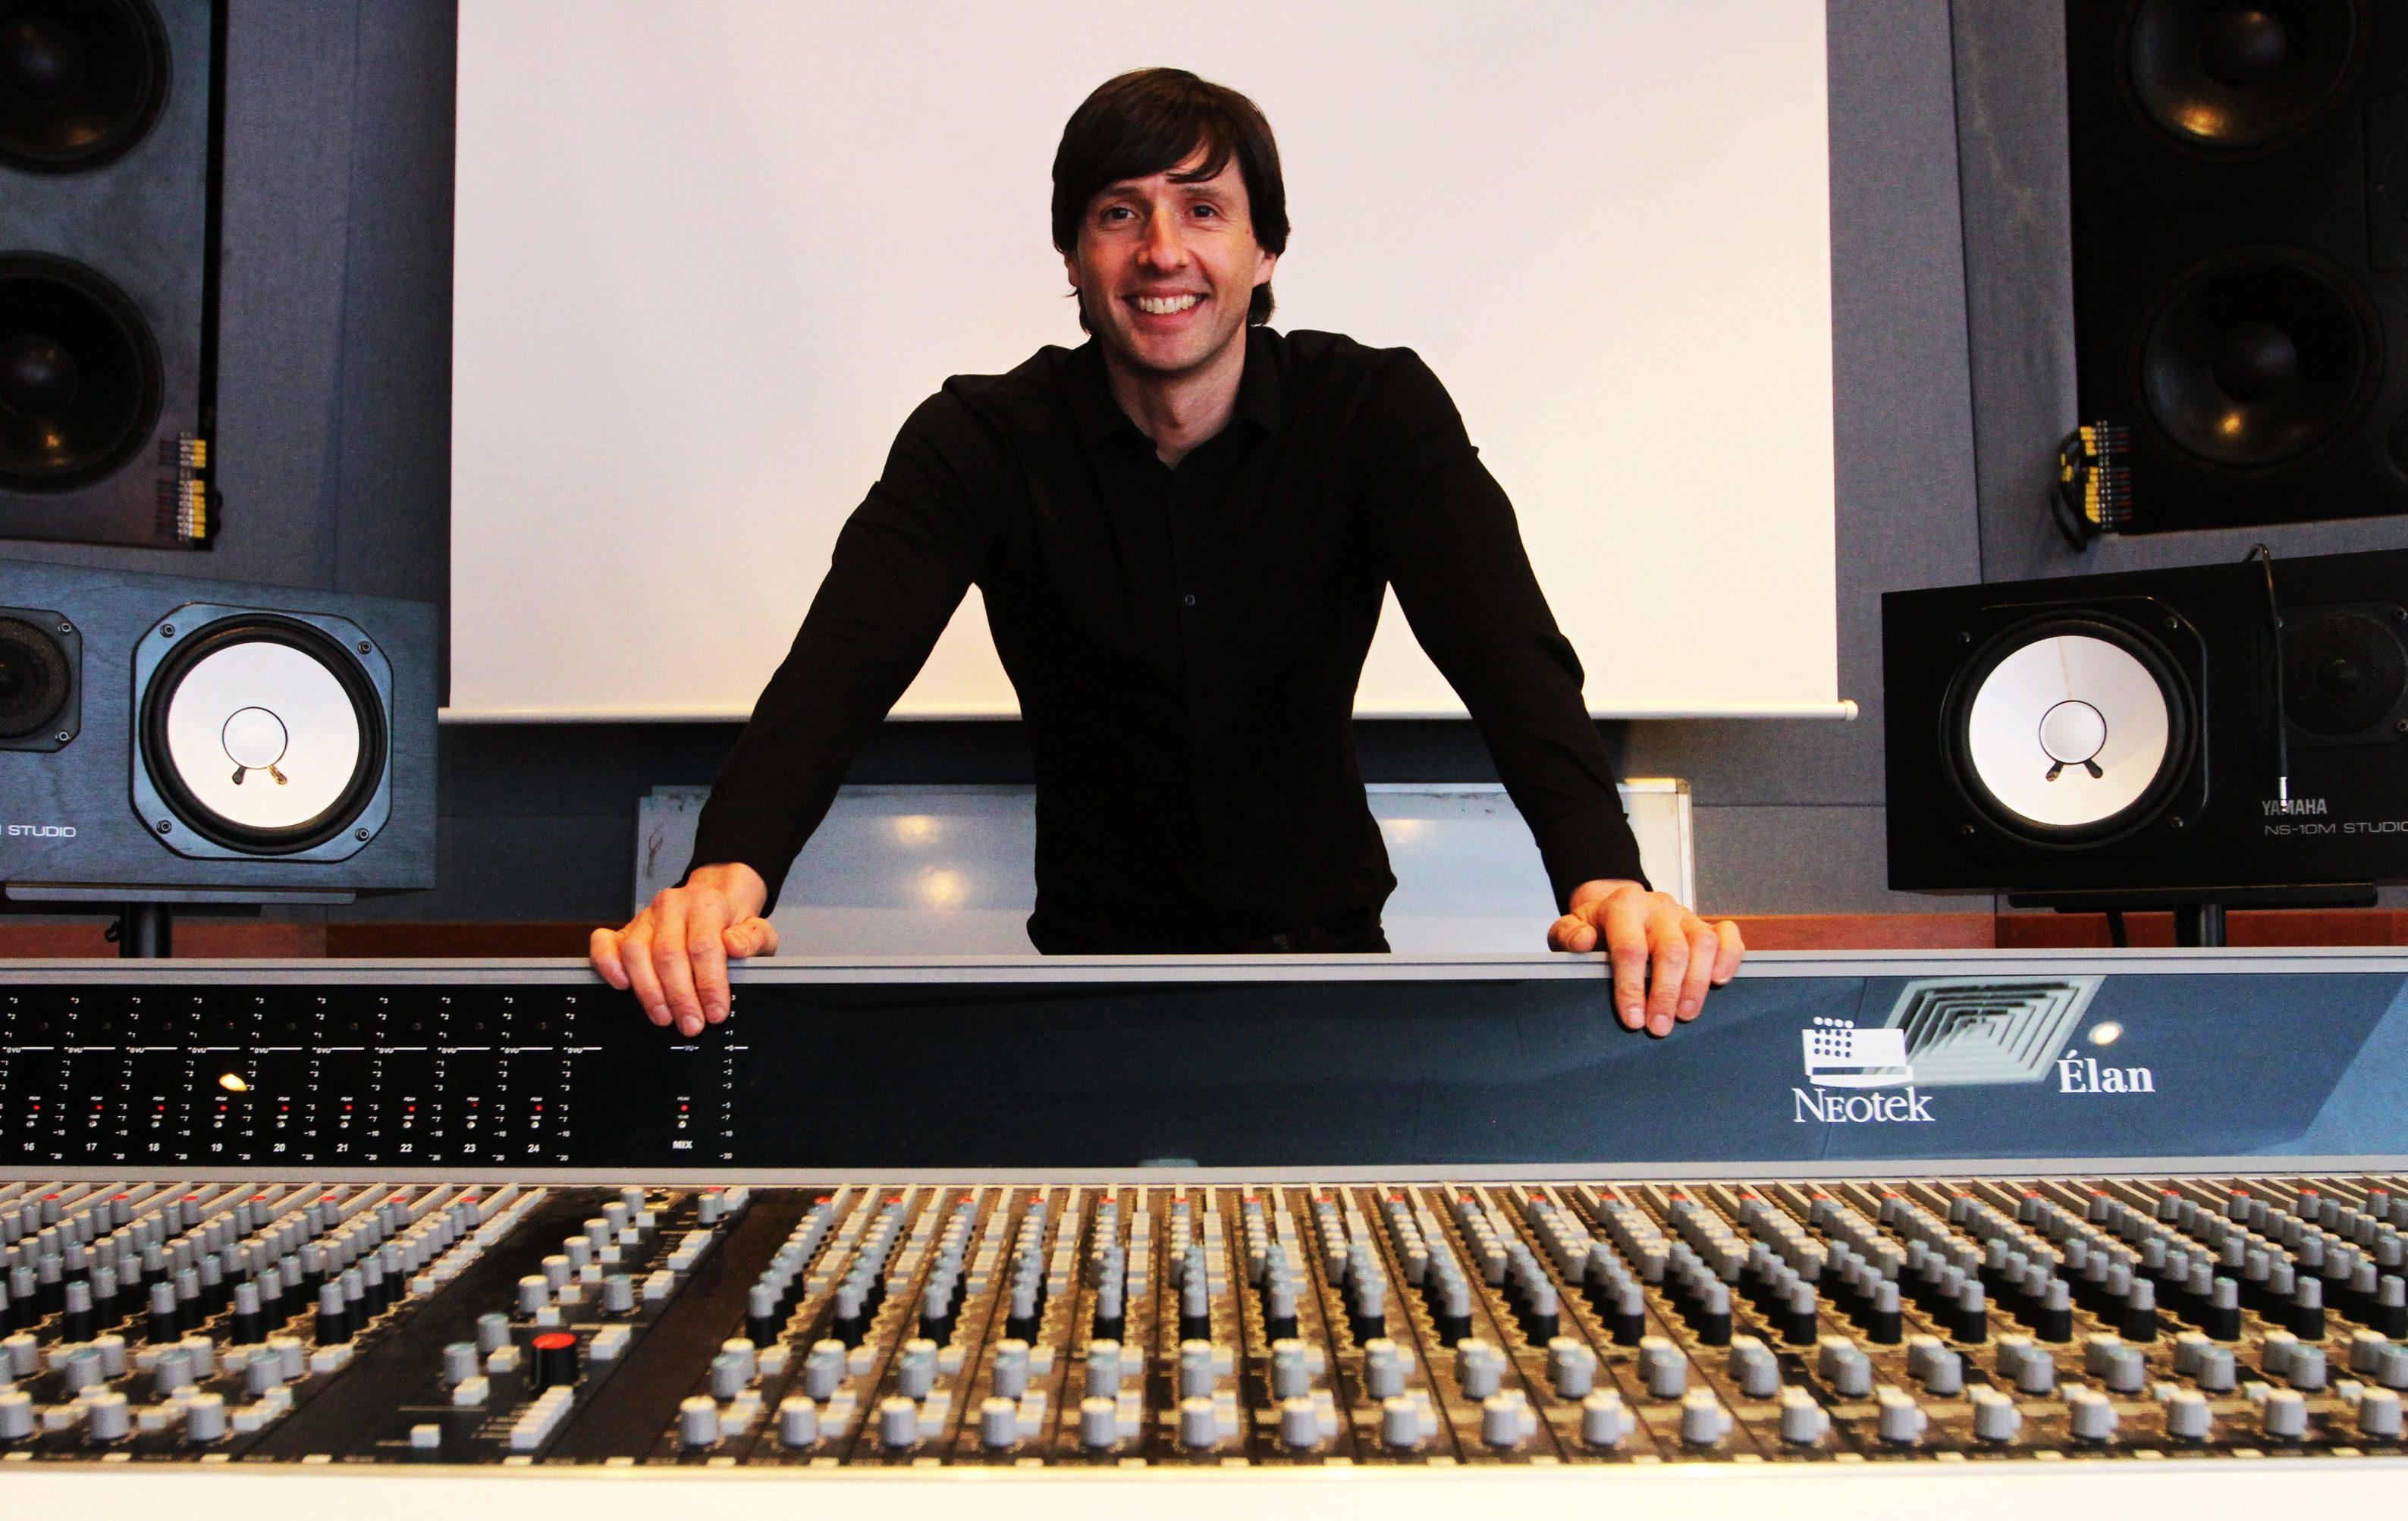 Music business lecturer Richard Smernicki